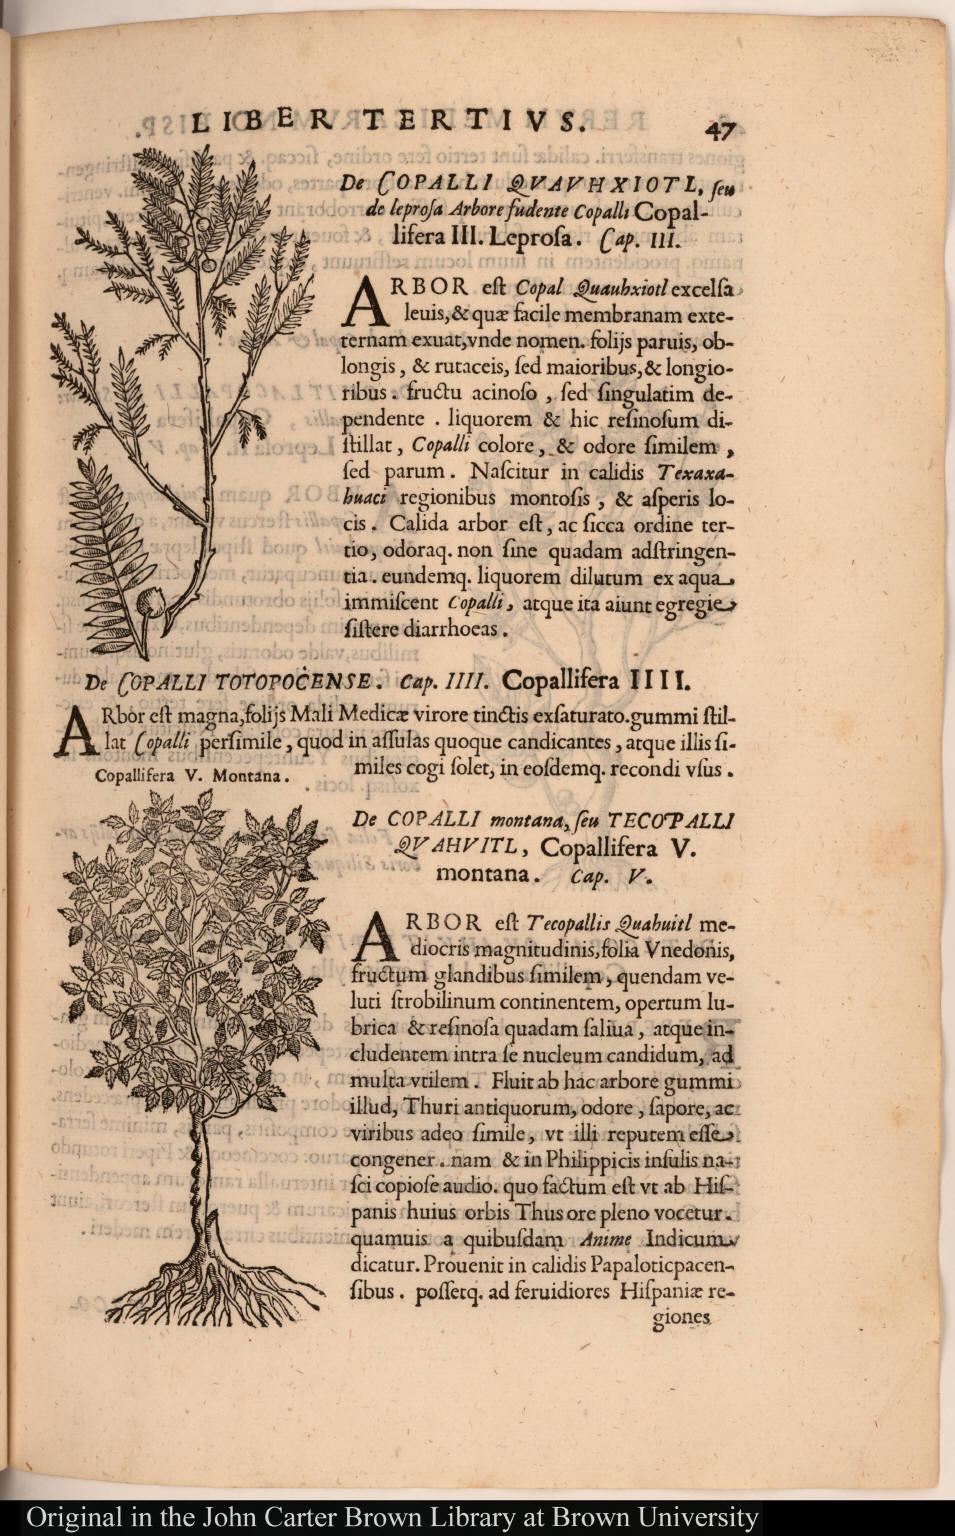 [top] [De Copalli Quauhxiotl, seu de leprosa Arbore fudente Copalli Copallifera III. Leprosa.]; [bottom] Copallifera V. Montana.